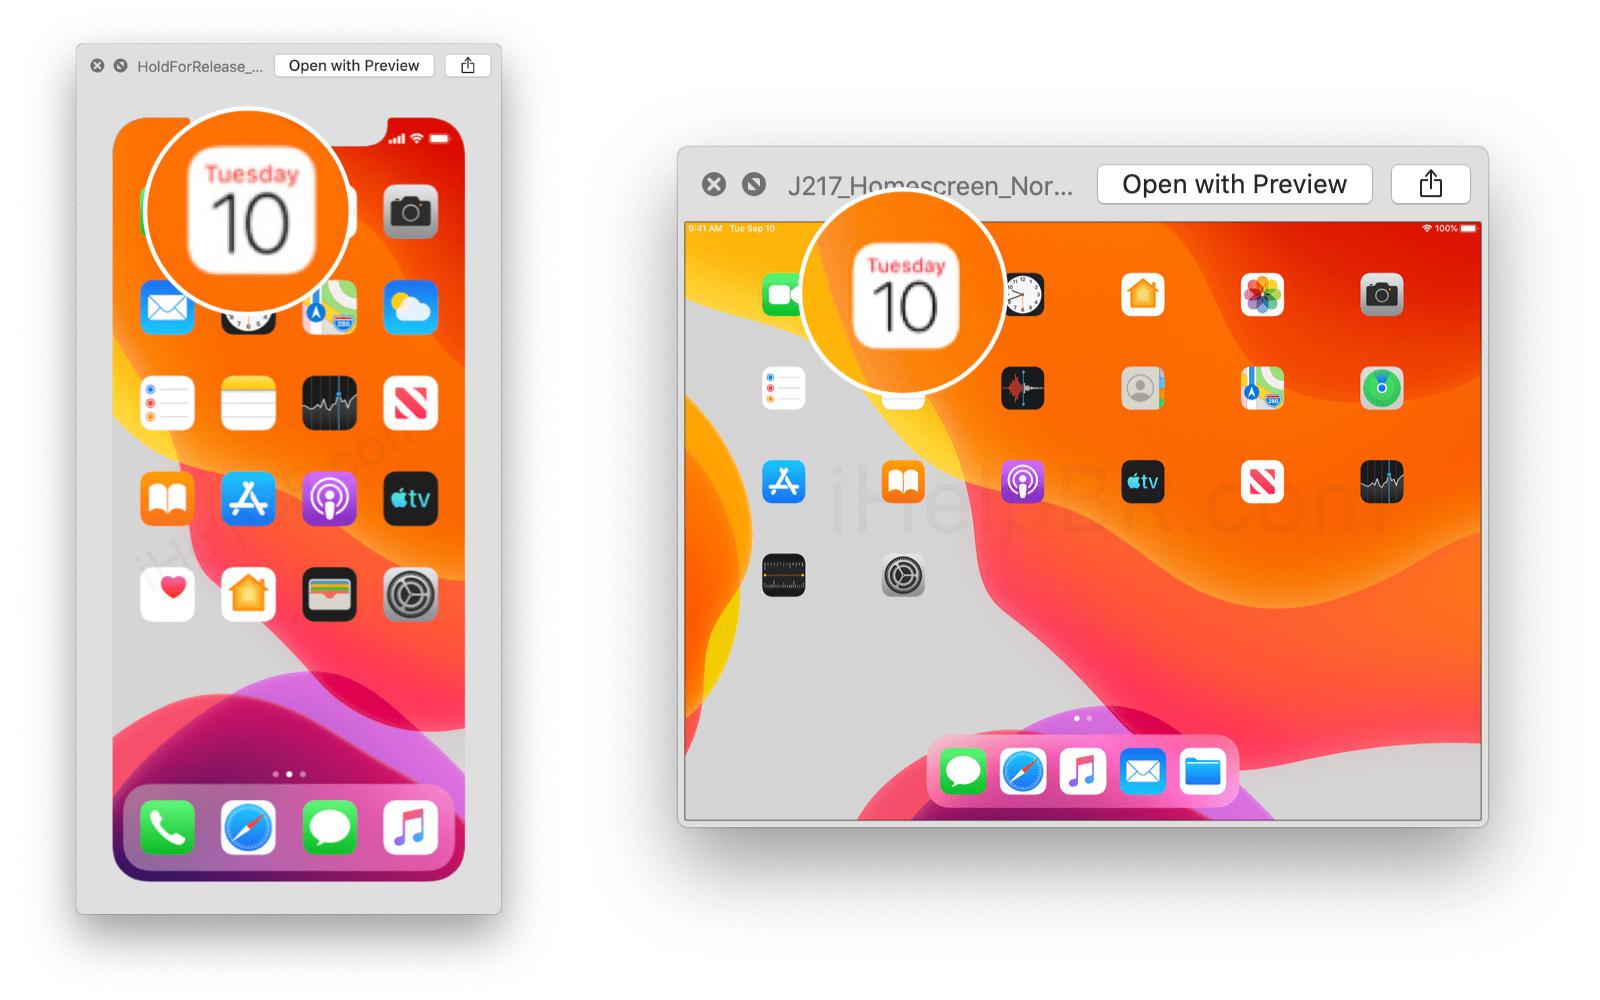 iOS13-beta-screenshot-on-iphone-date.jpg